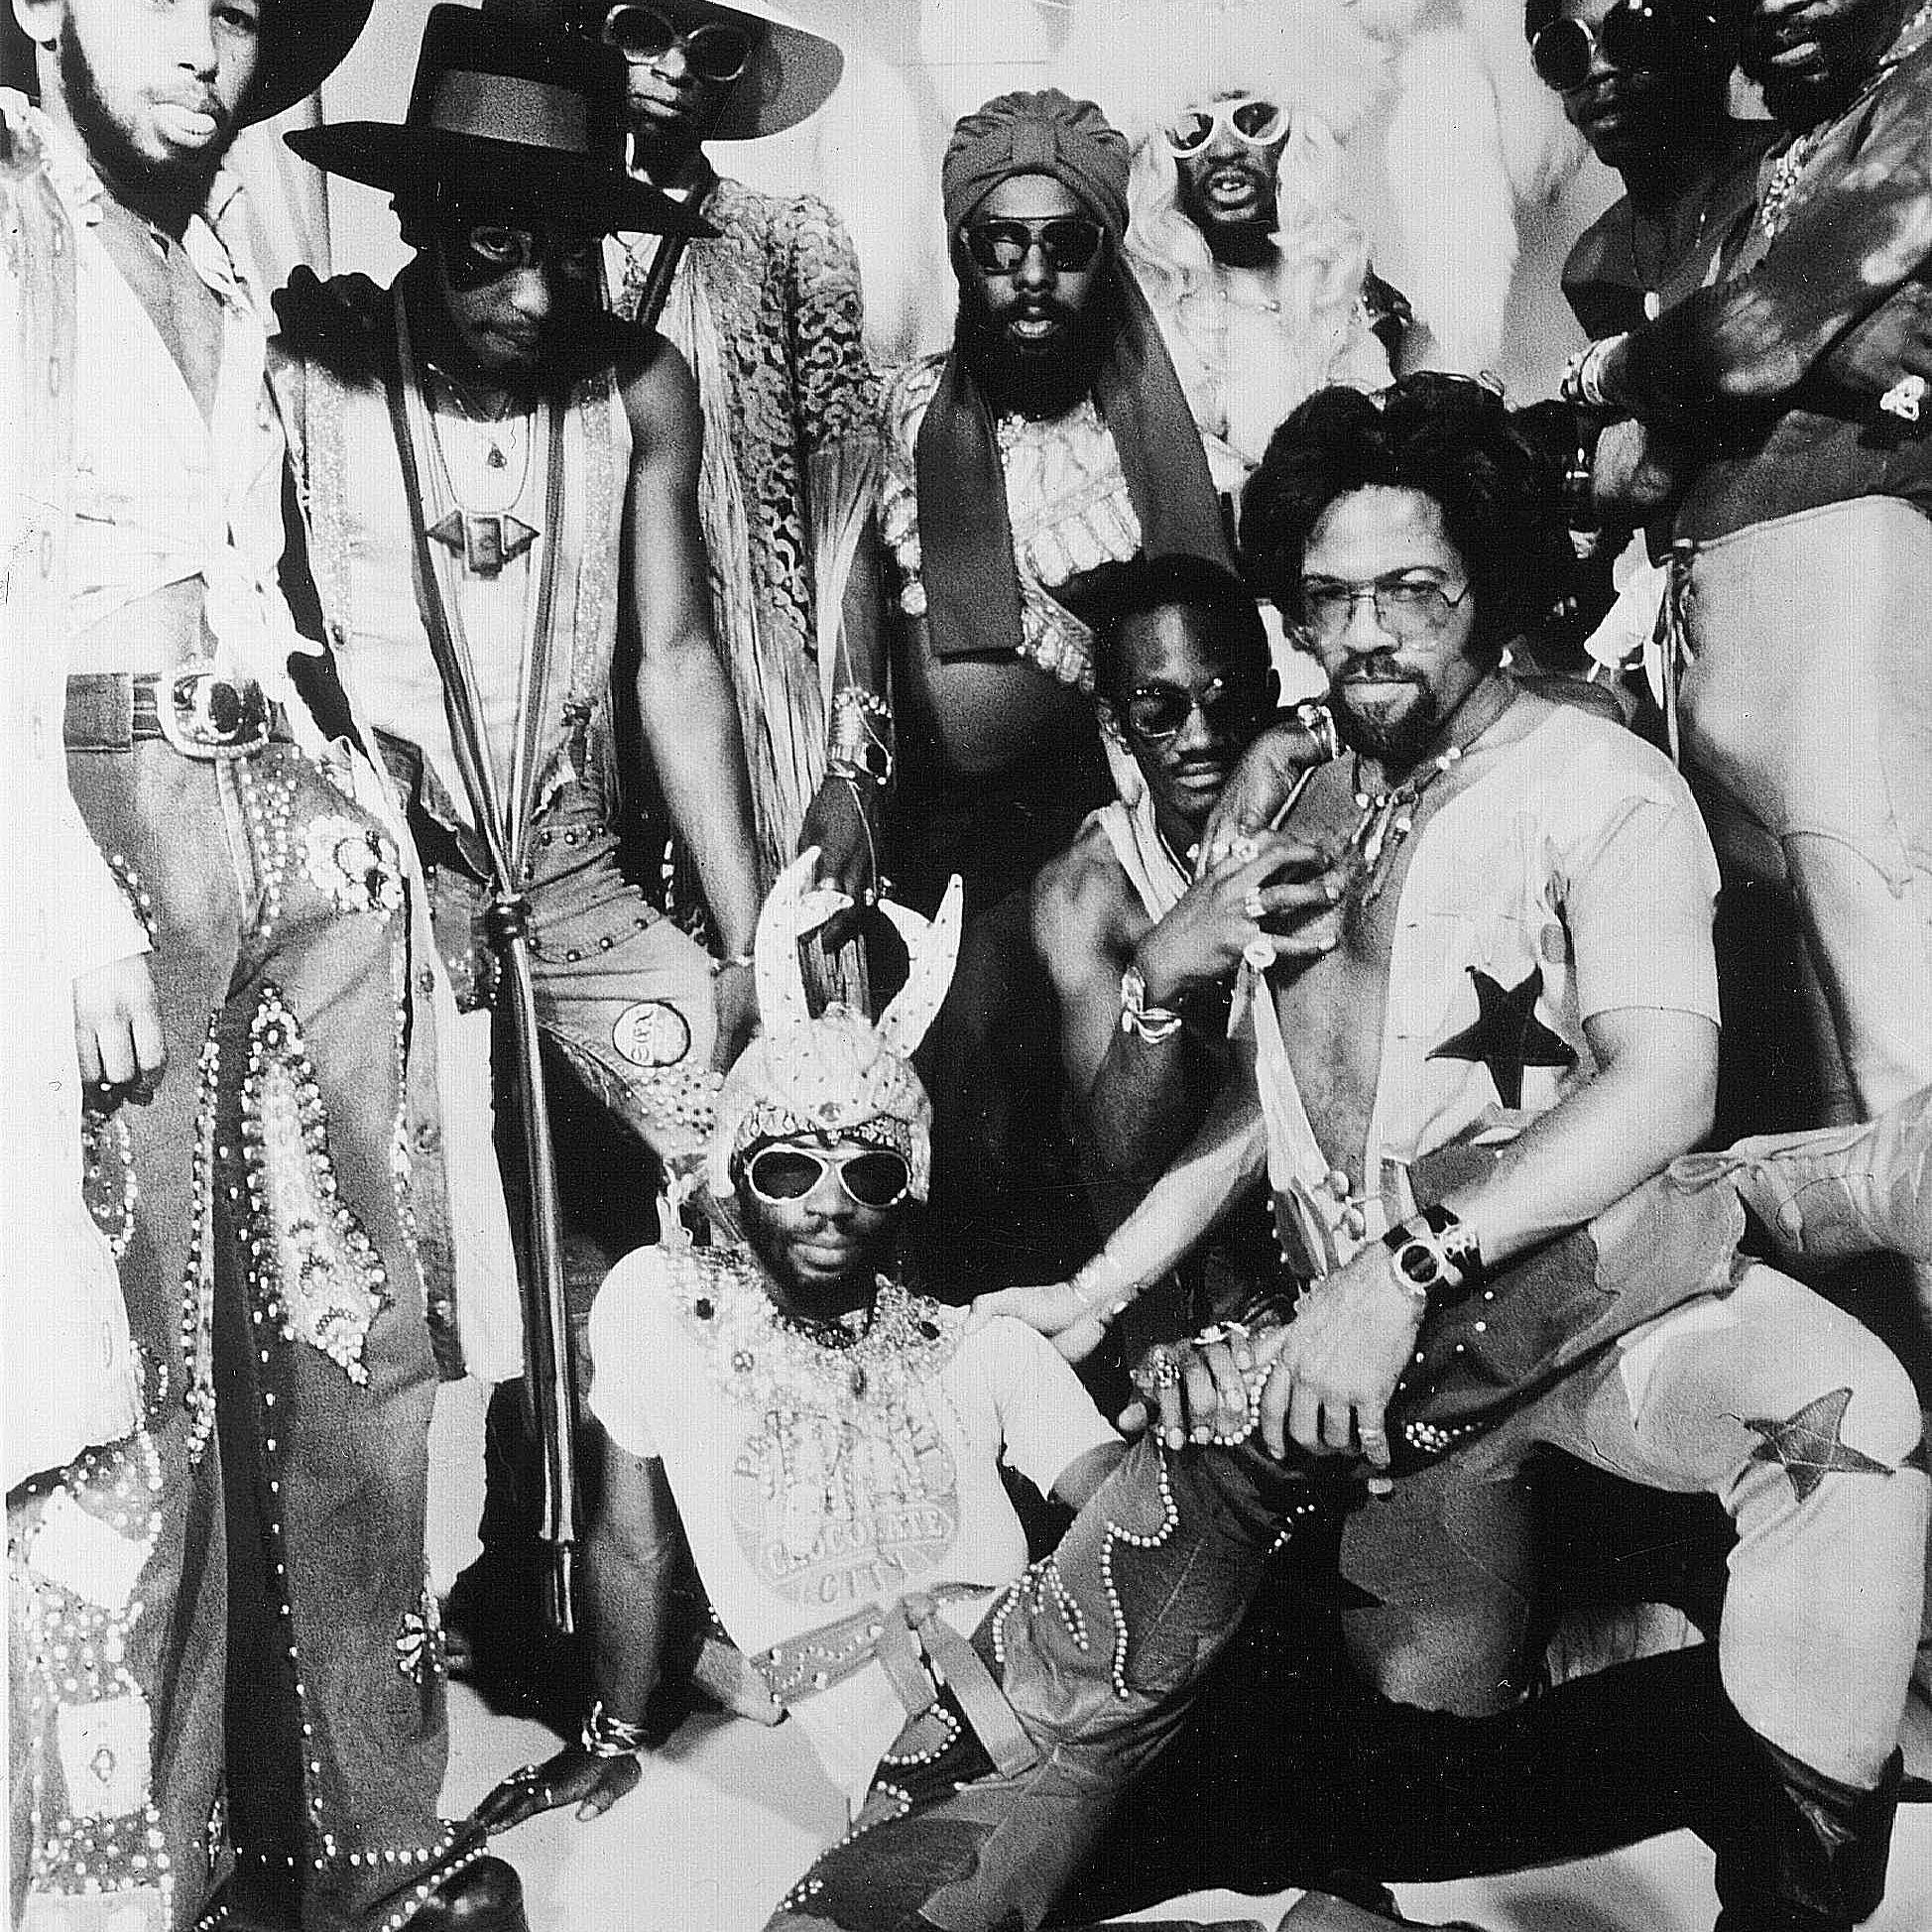 The band Parliament-Funkadelic.